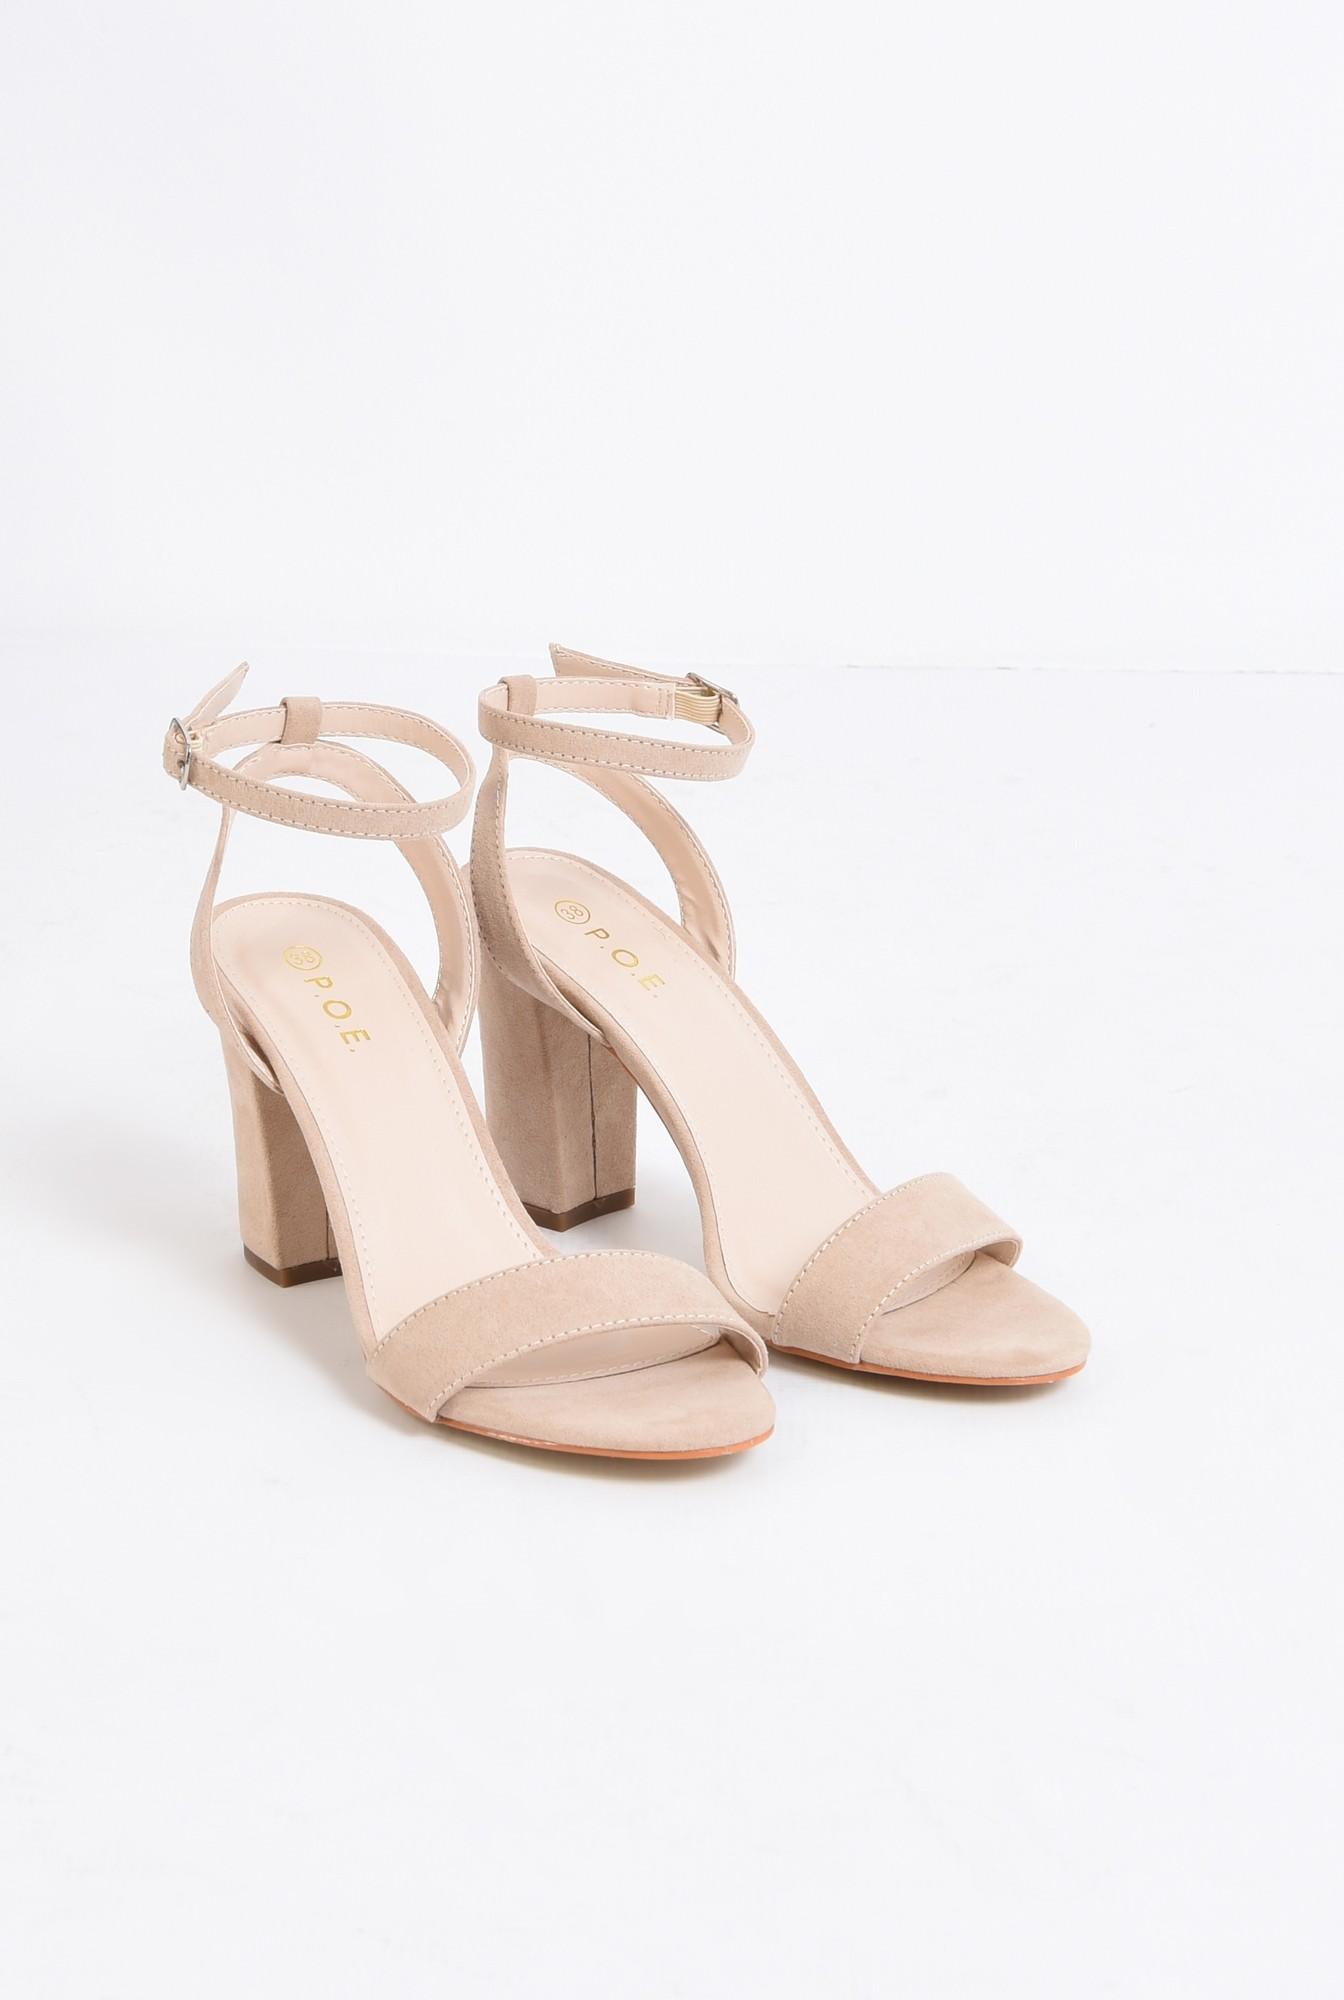 1 - sandale elegante, crem, toc gros, piele intoarsa eco